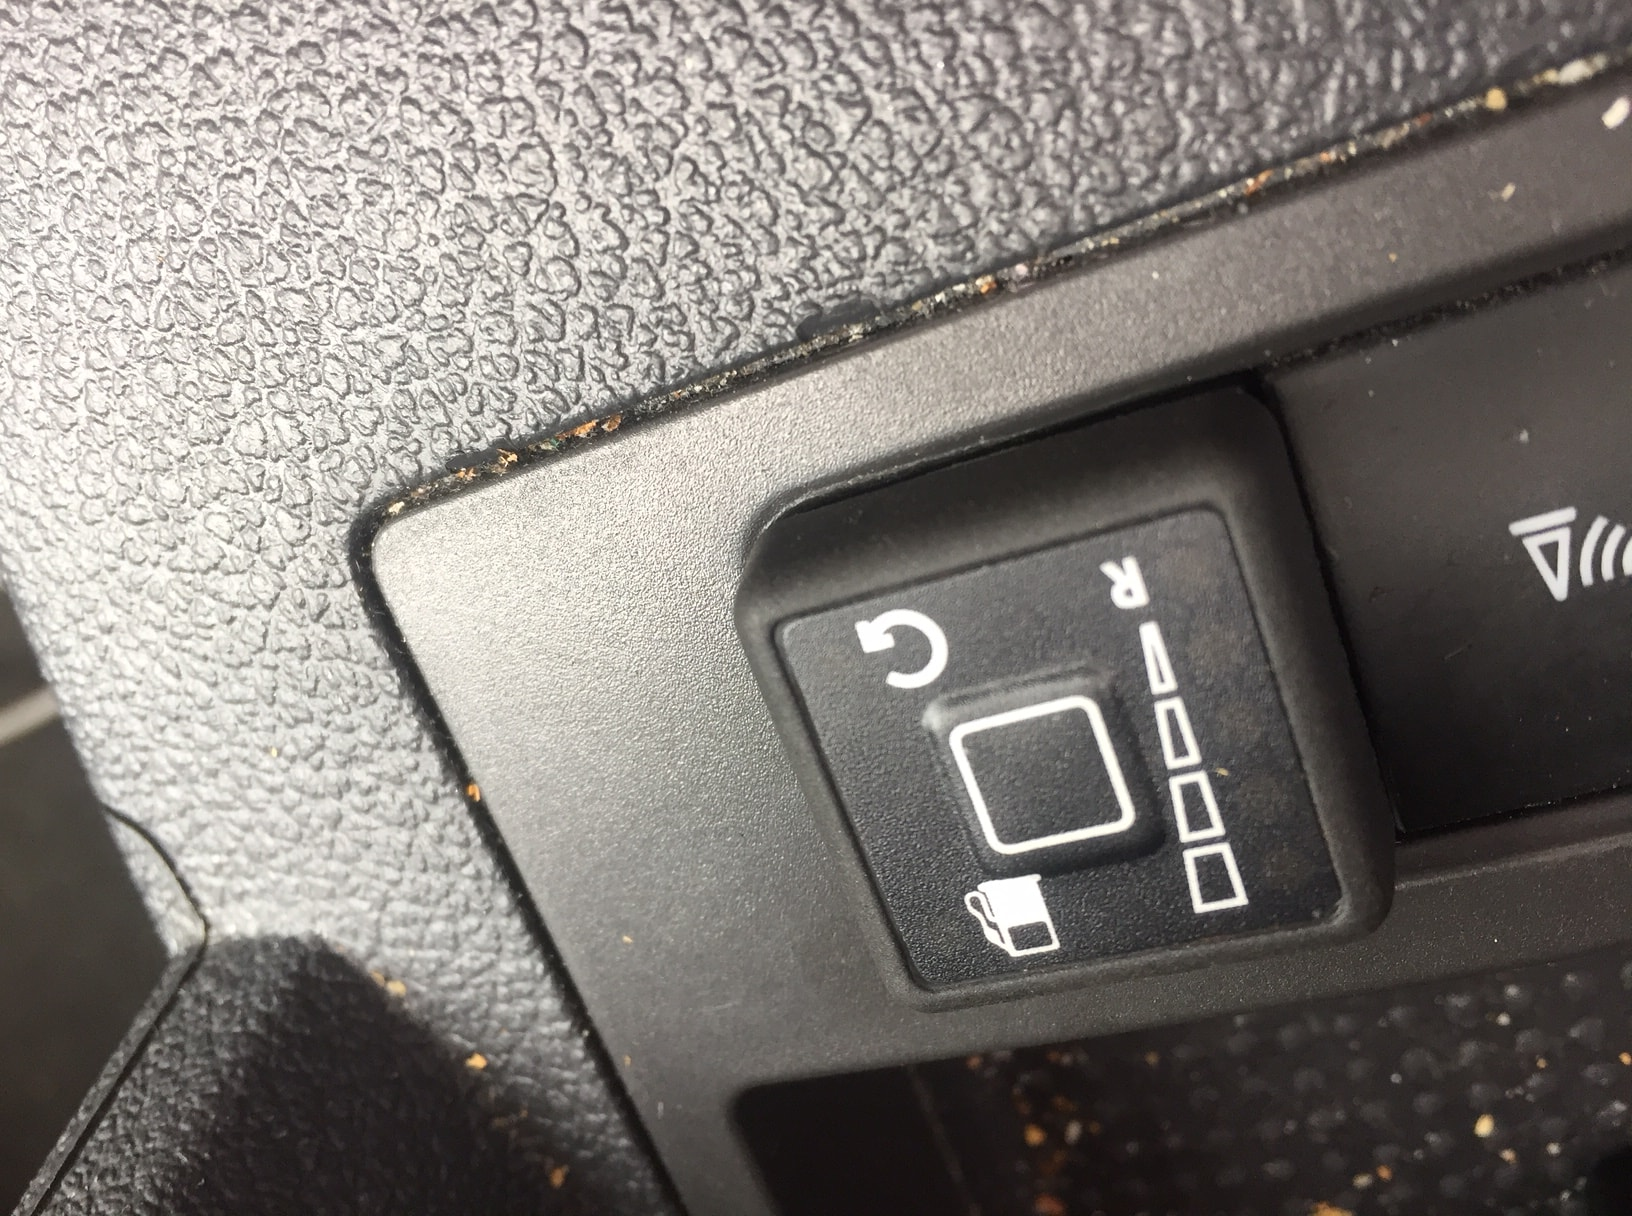 VW-Touran-14-Frontgas